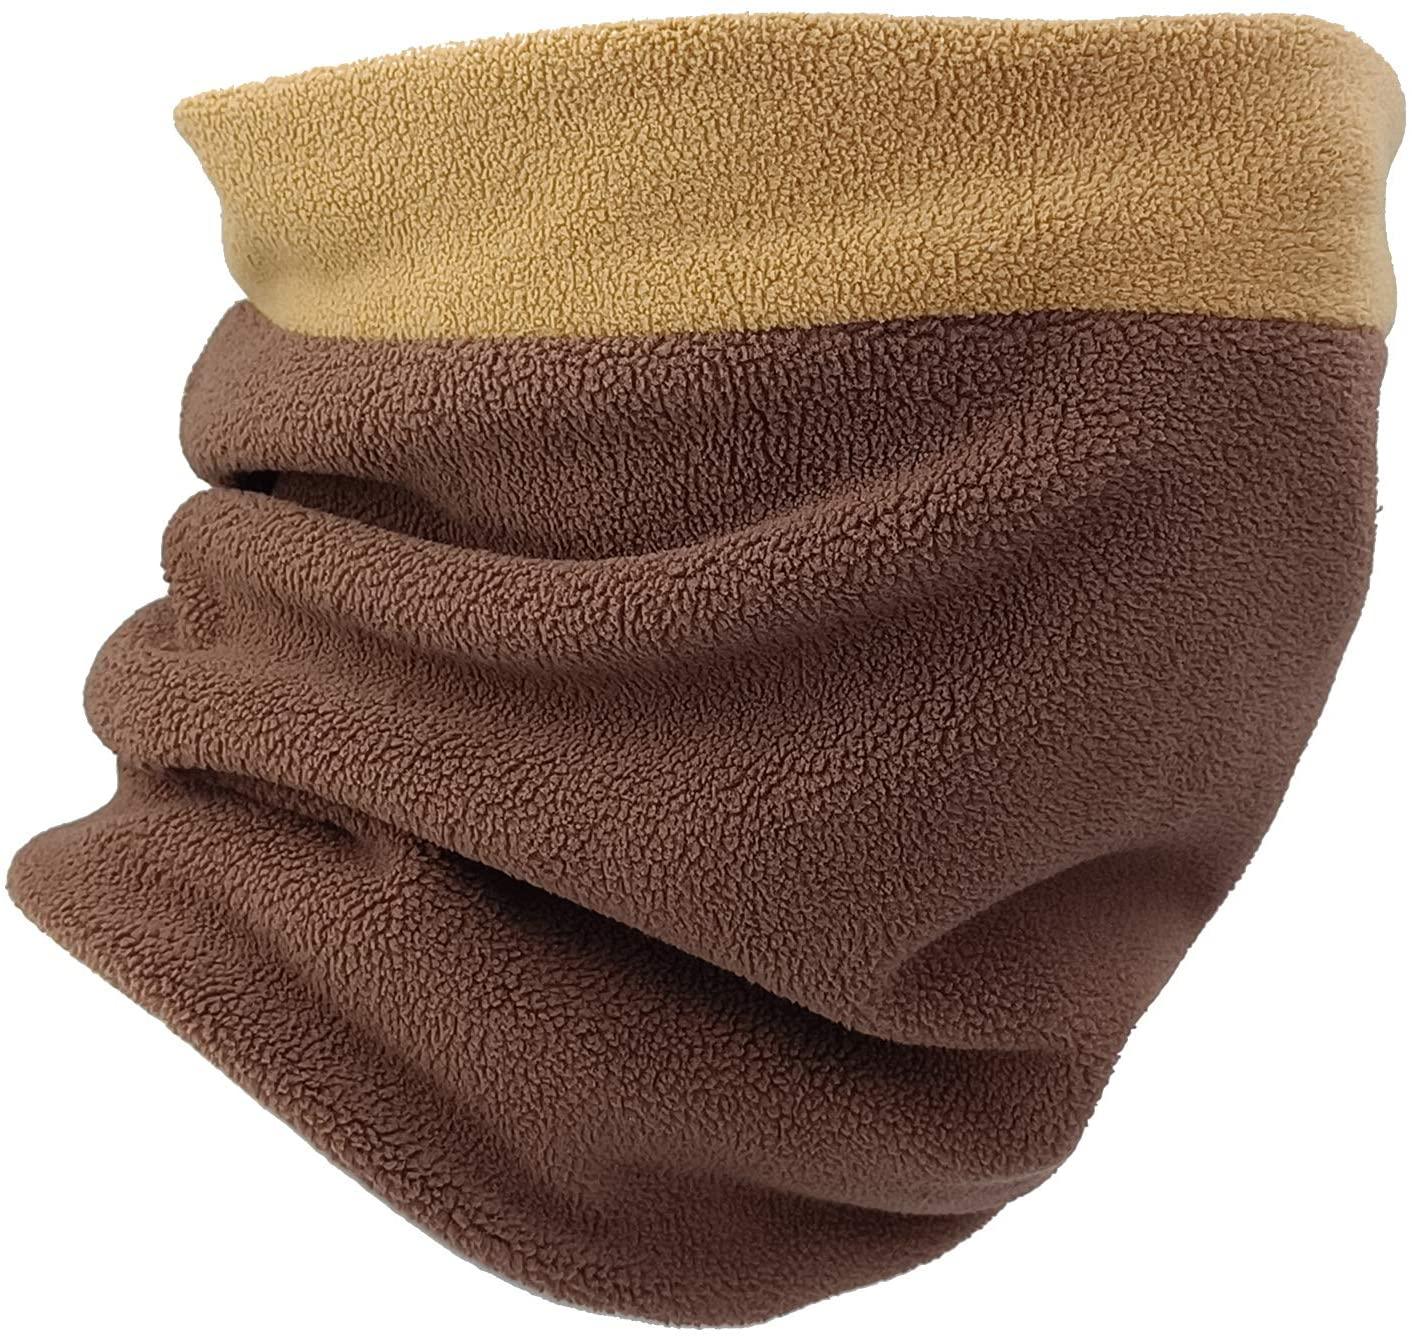 Fycert Neck Warmer - Winter Neck Gaiter & Balaclava for Men Women - Cold Weather Face Cover, Mask Scarf & Shield for Ski Snowboard (Khaki/Coffee)